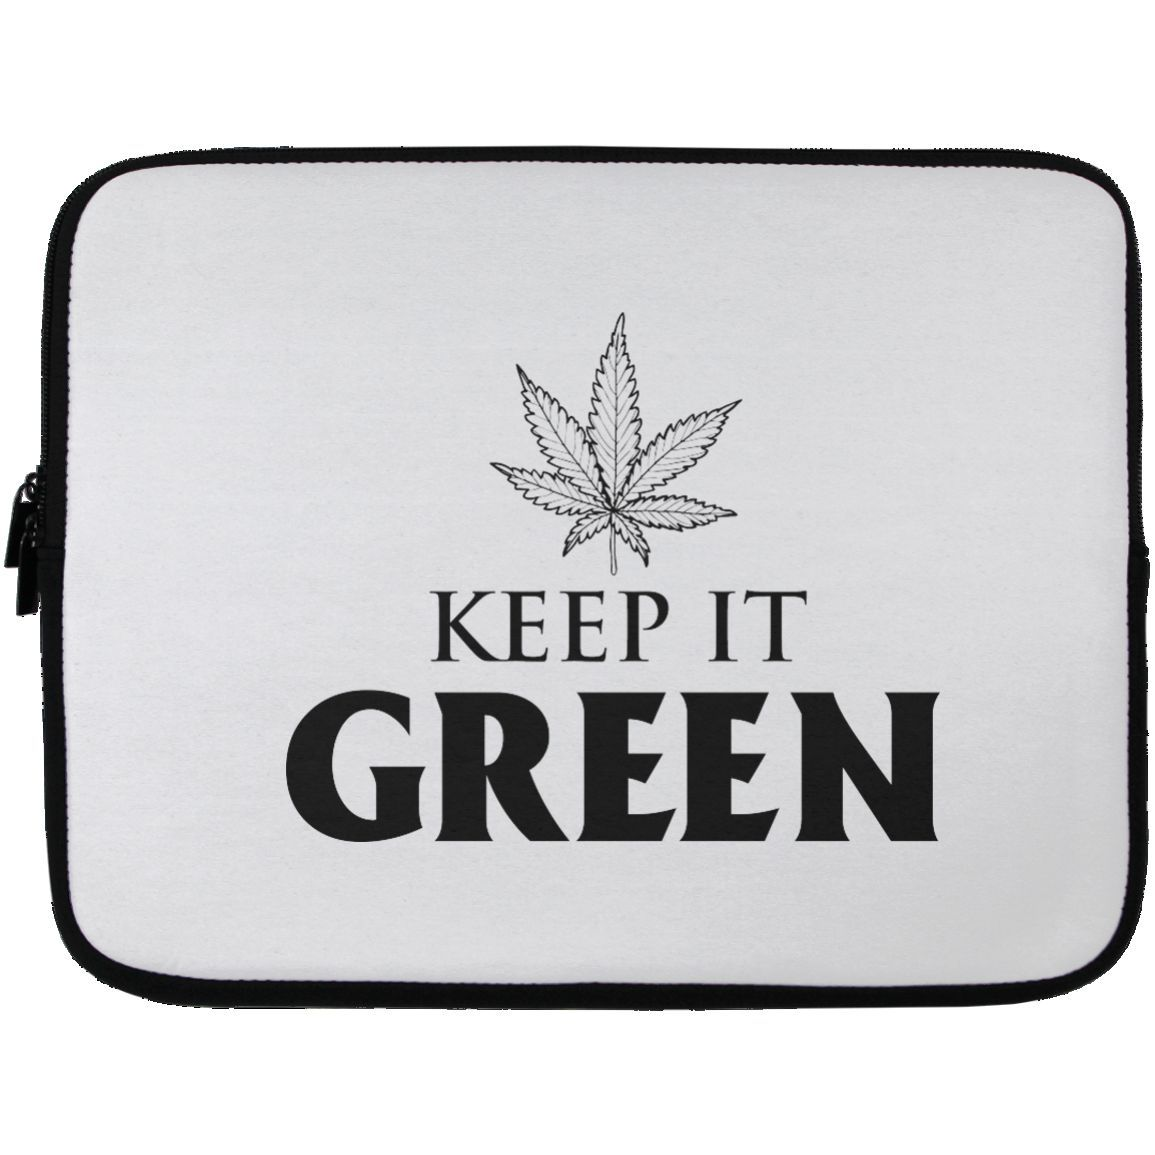 Keep It Green Laptop Sleeve - 13 inch